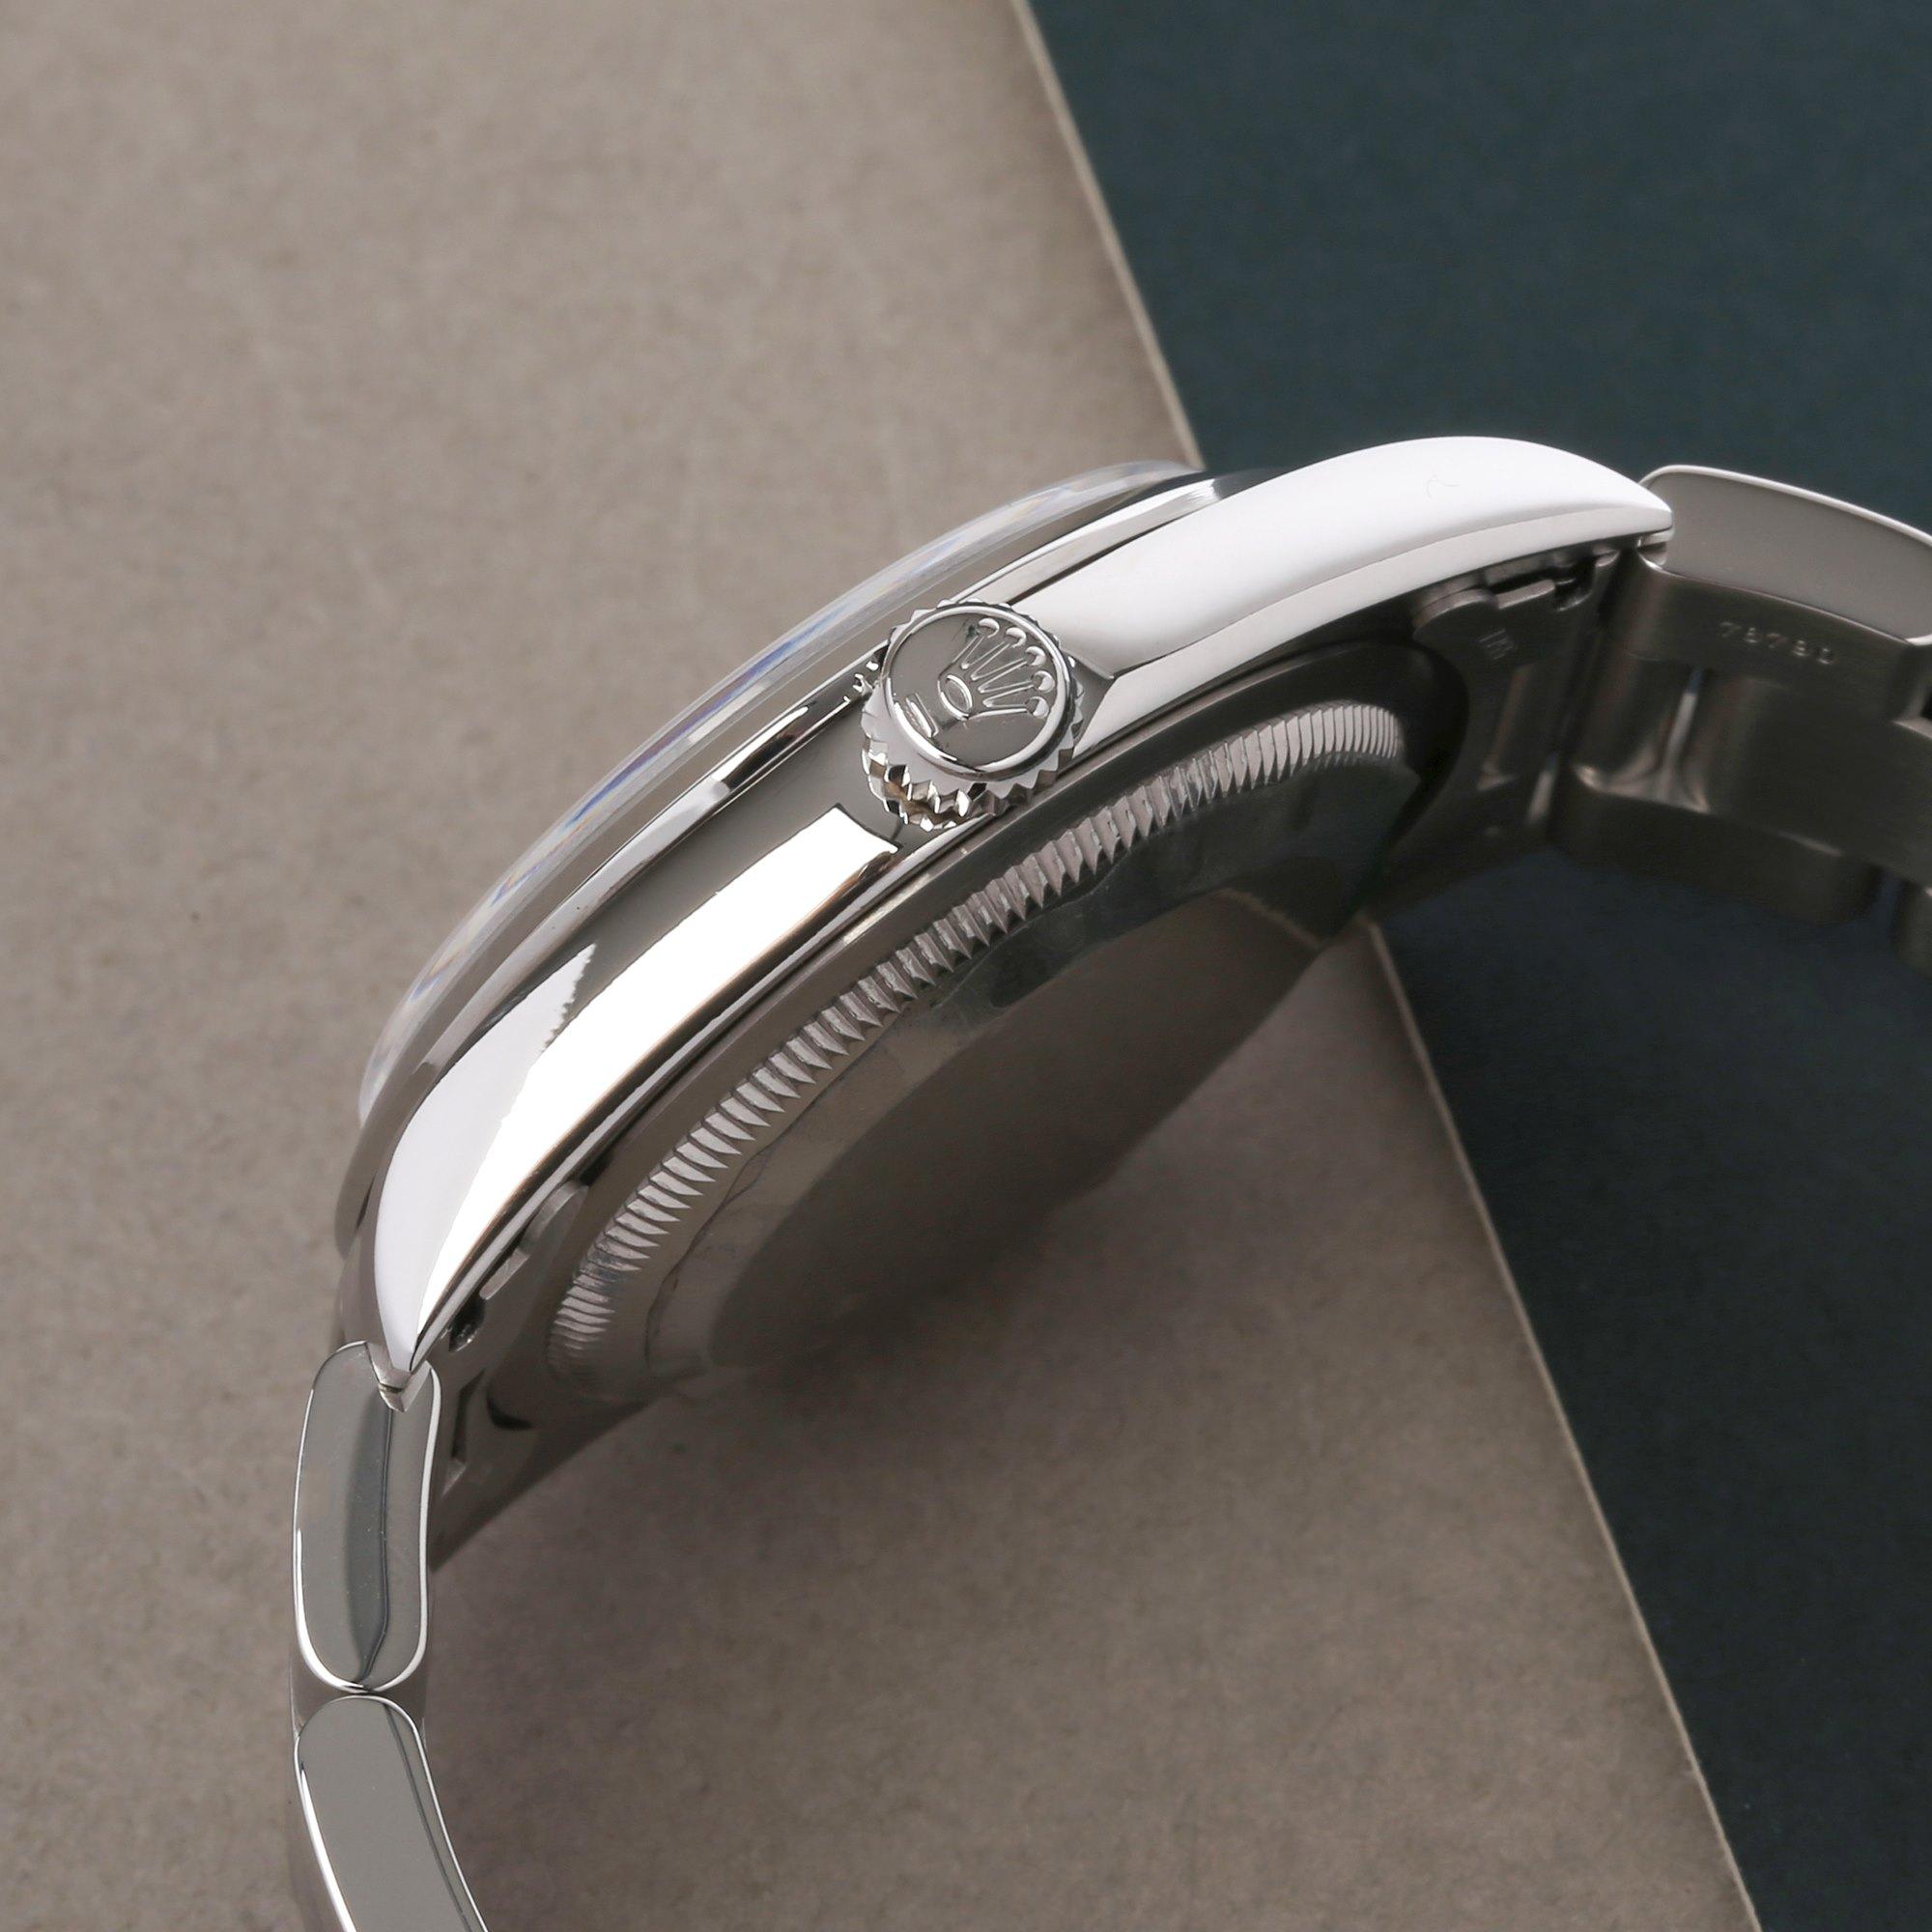 Rolex Explorer Stainless Steel 14270